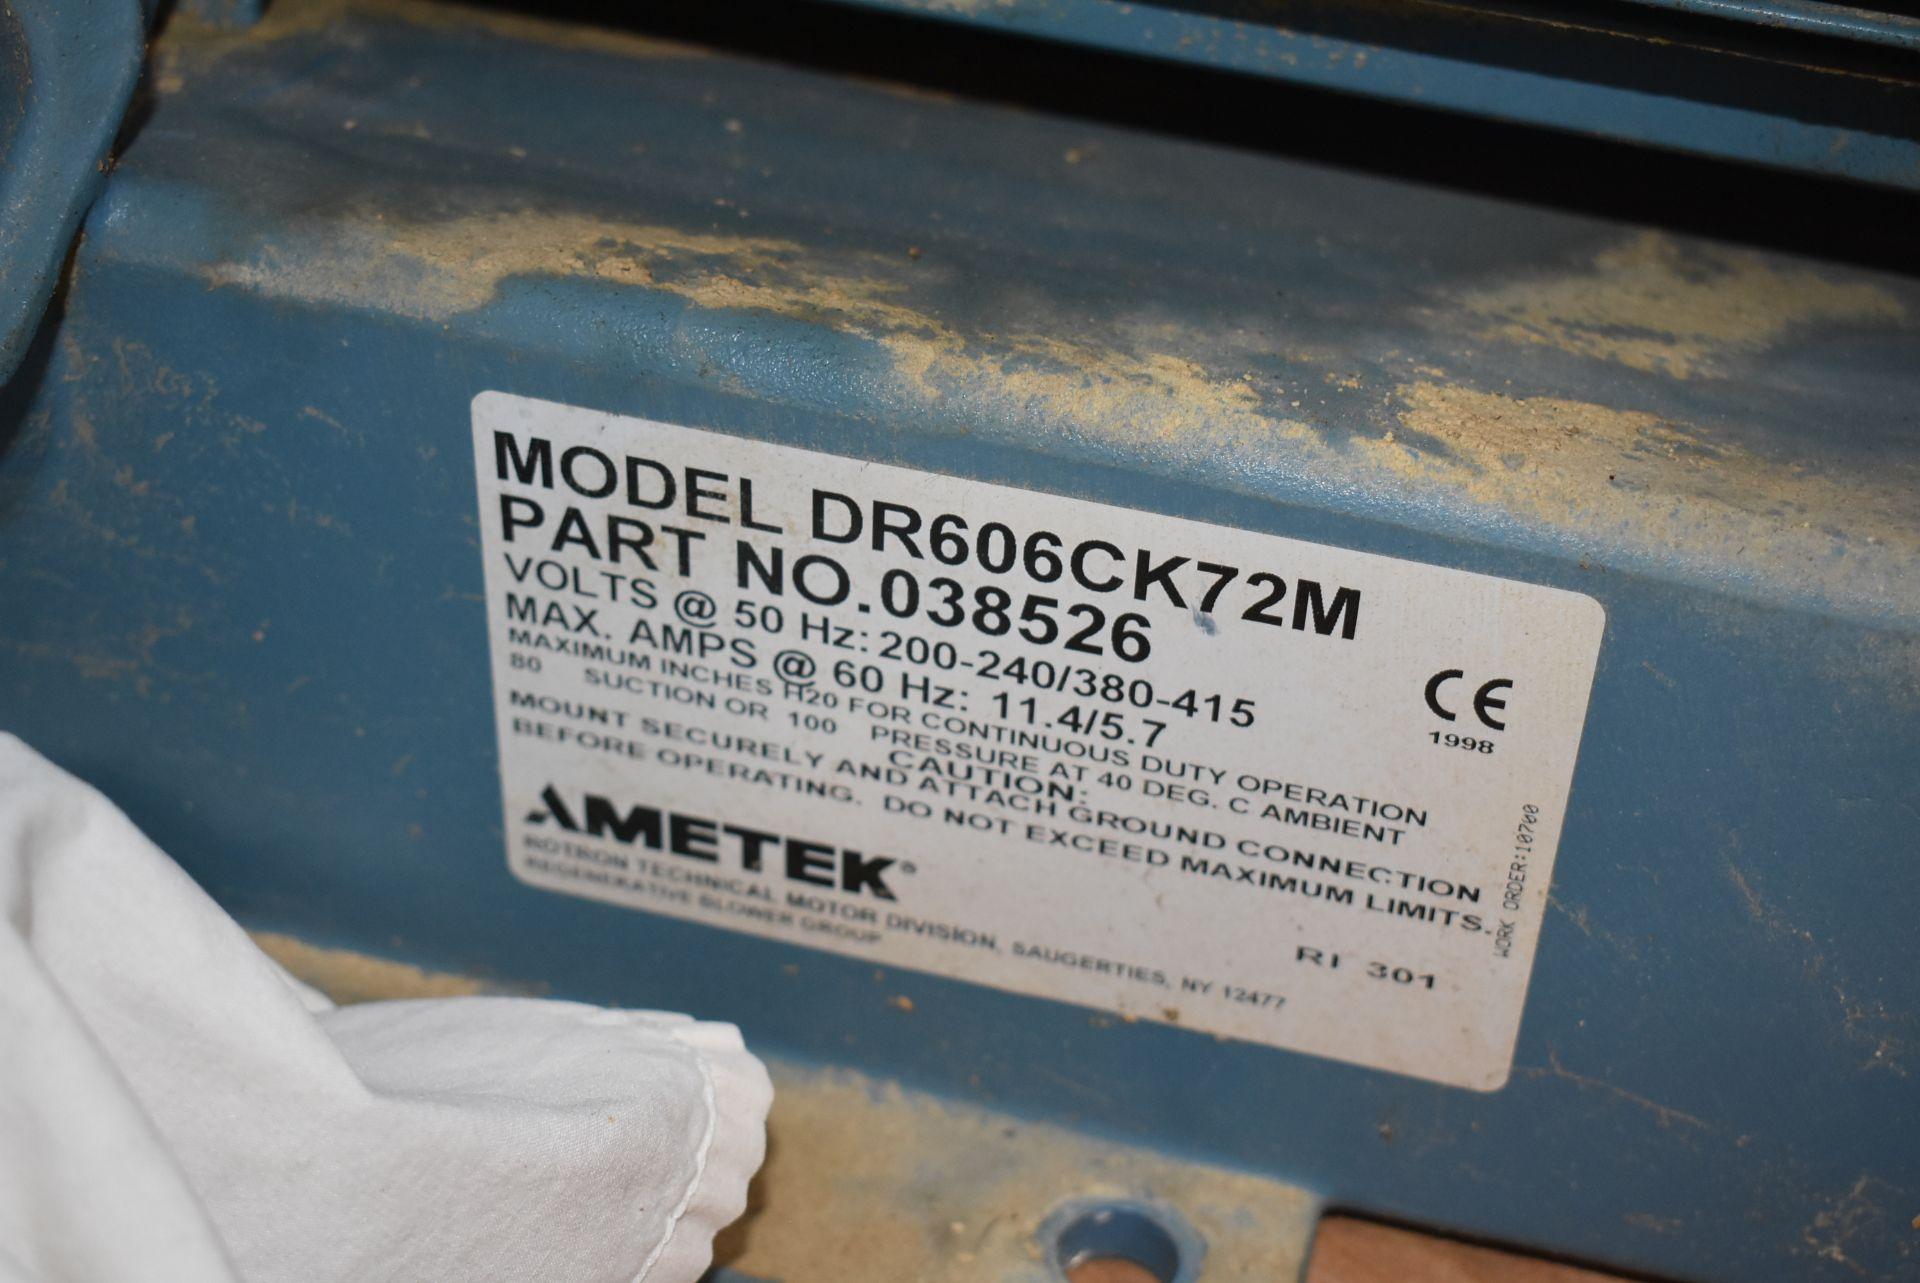 Ametek EG Rotron Model #DR606CK72M Blower w/Motor - Image 2 of 3